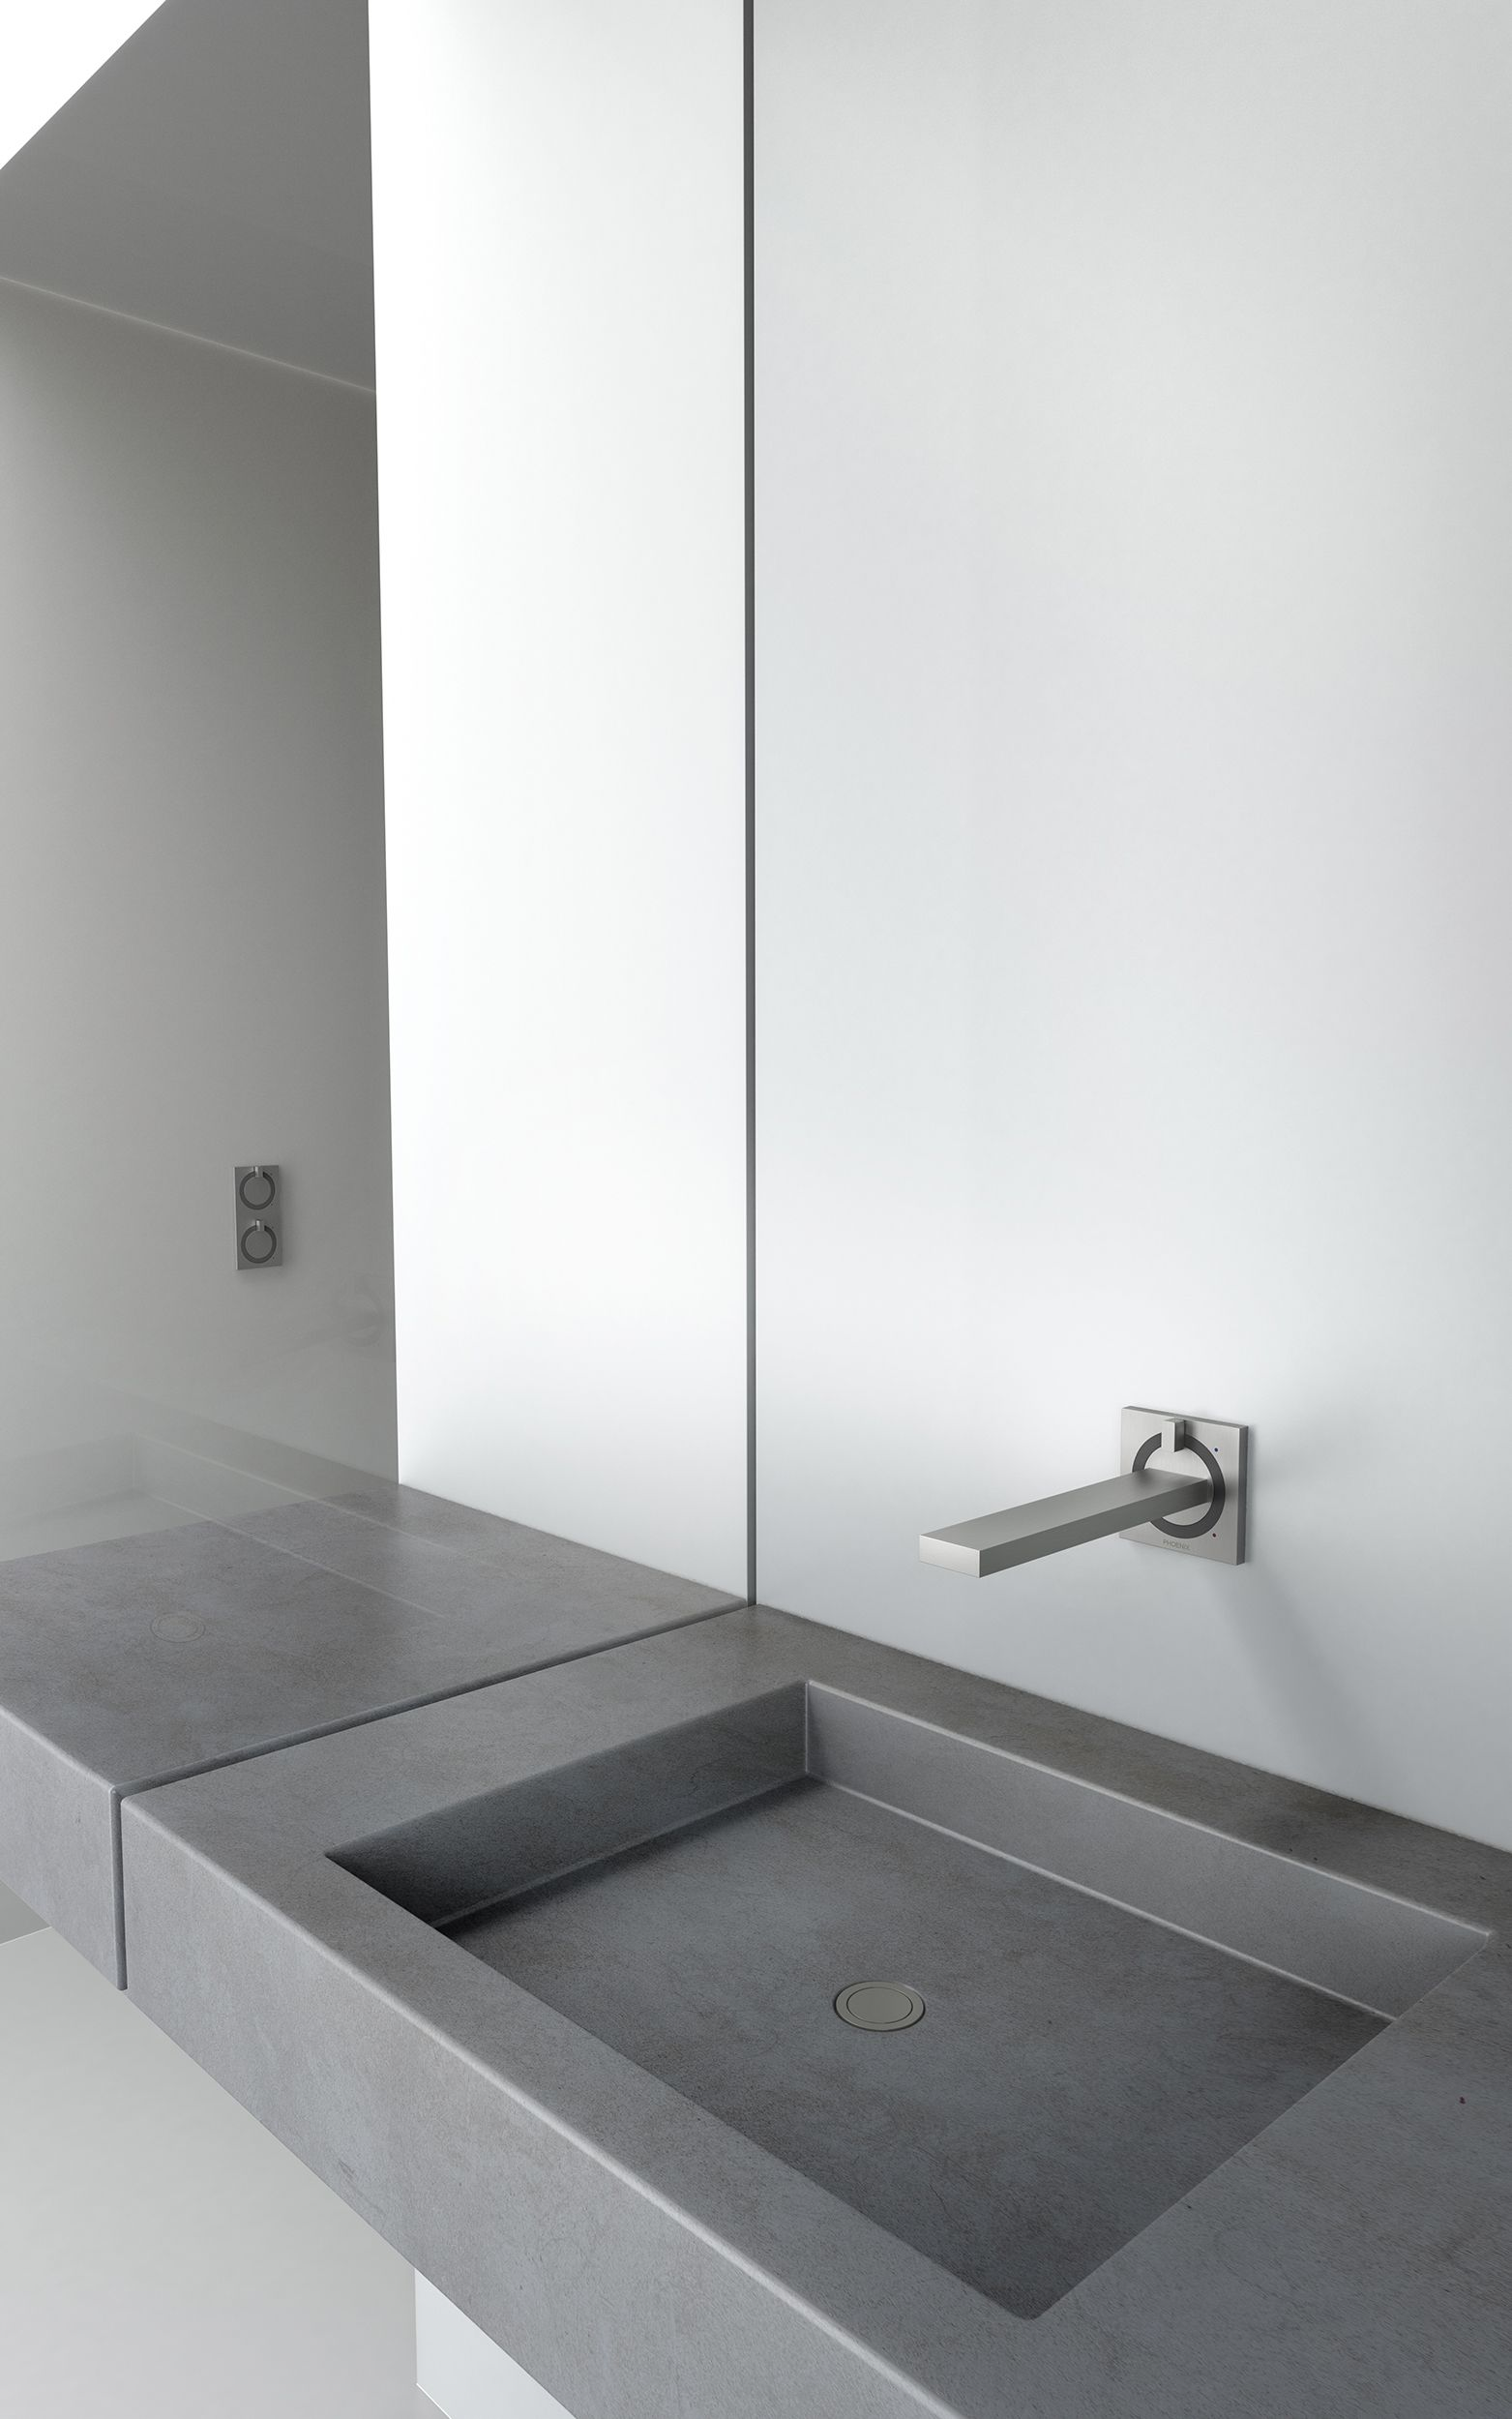 Ortho Wall Basin Mixer Set Twin Shower Mixer Matte Brushed Nickel By Phoenix Tapware Twin Shower Basin Basin Mixer